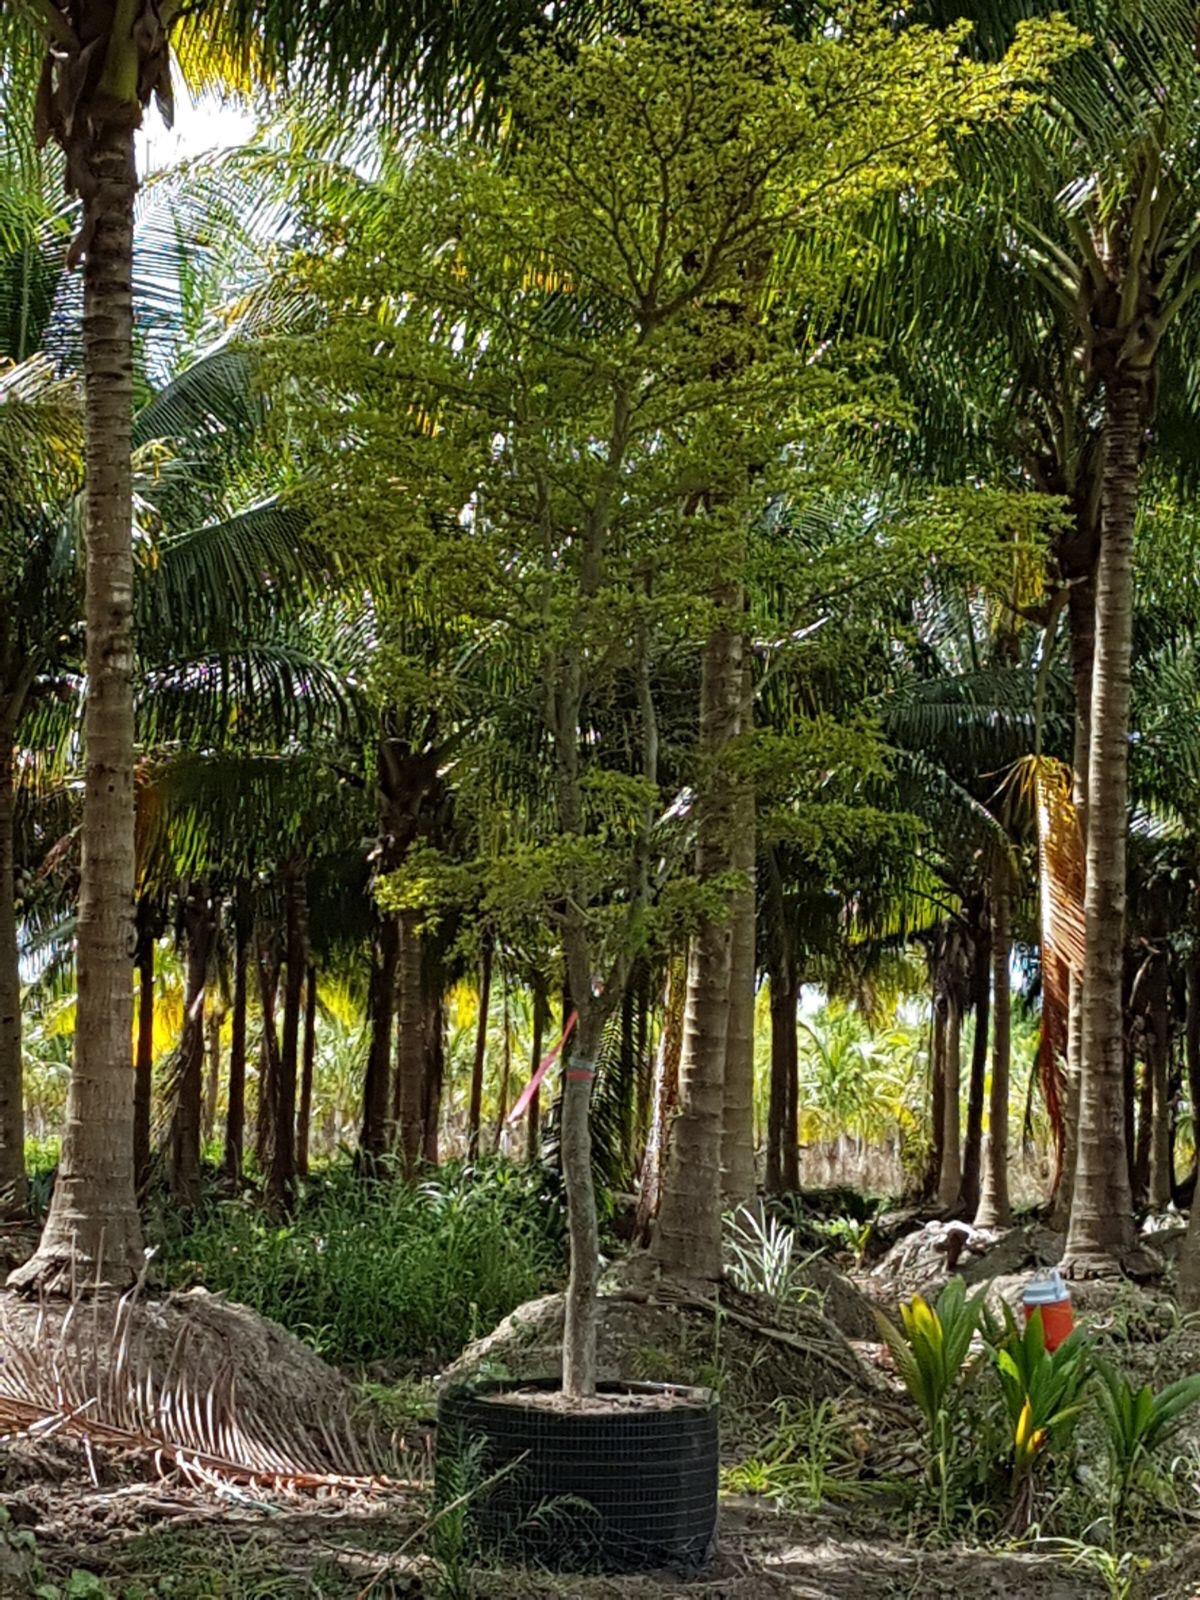 Bucida buceras Tree